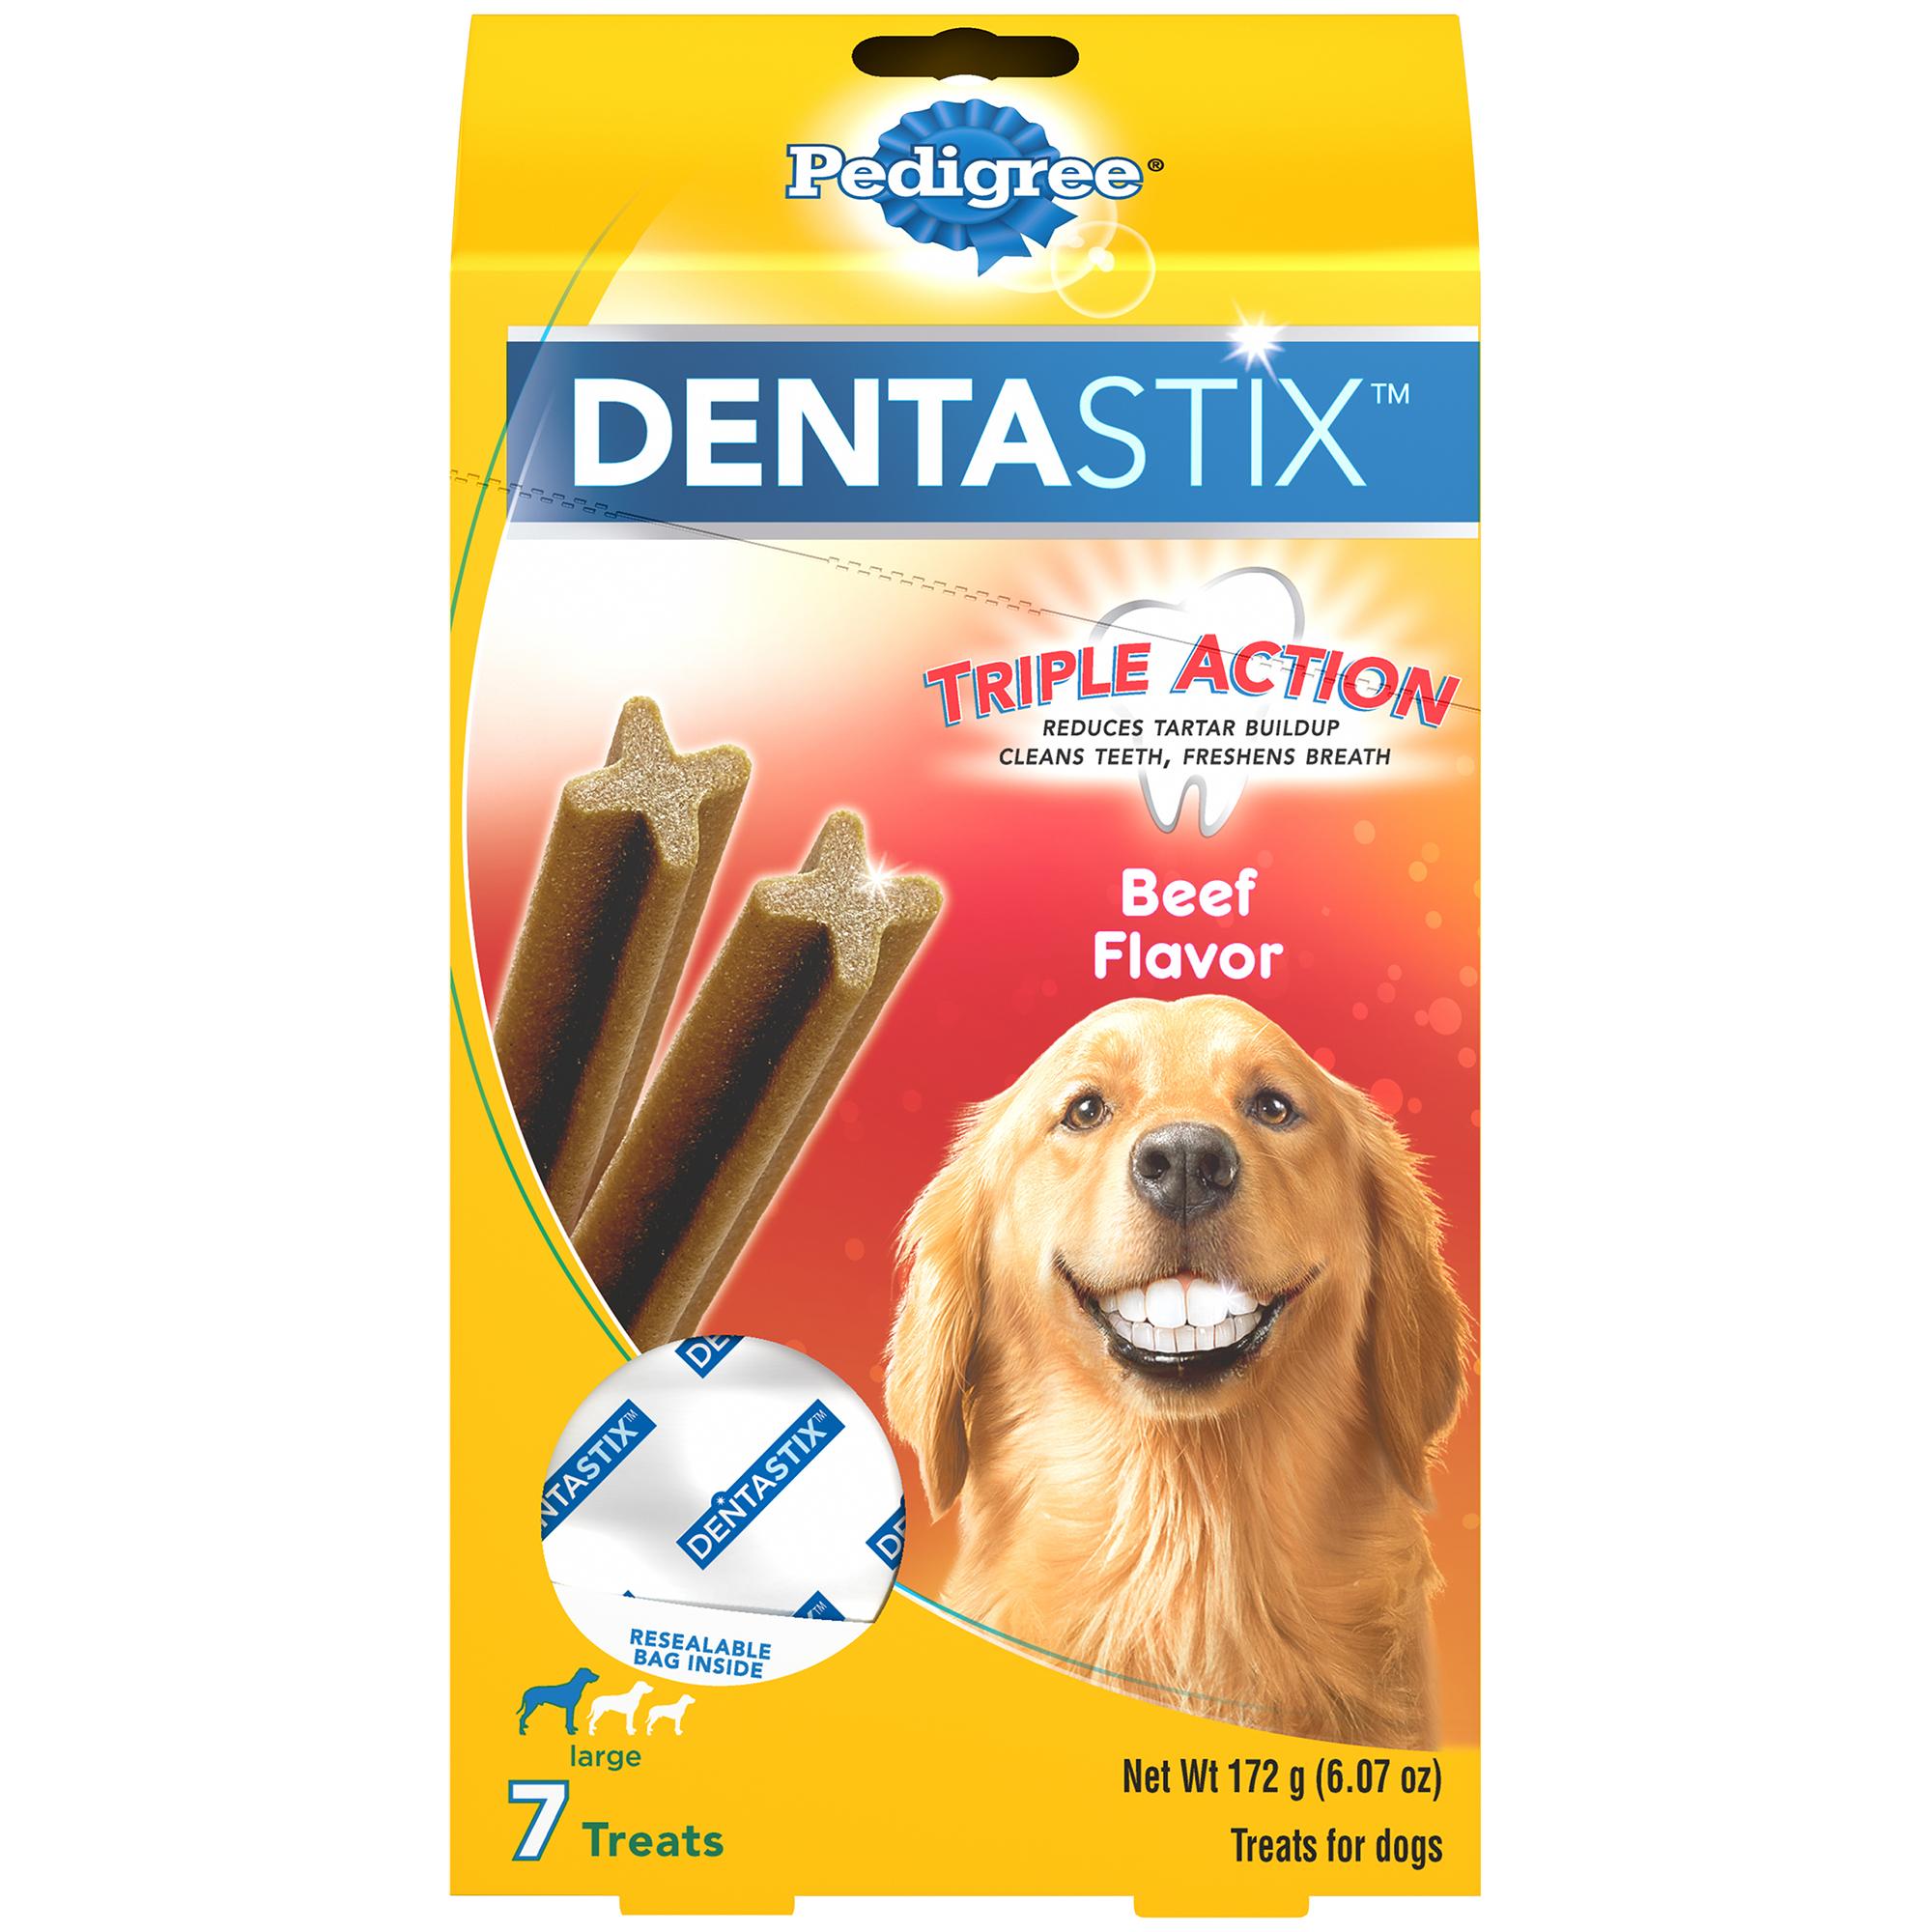 Pedigree Dentastix Large Dental Dog Treats Beef Flavor, 6.07 oz. (7 Treats)